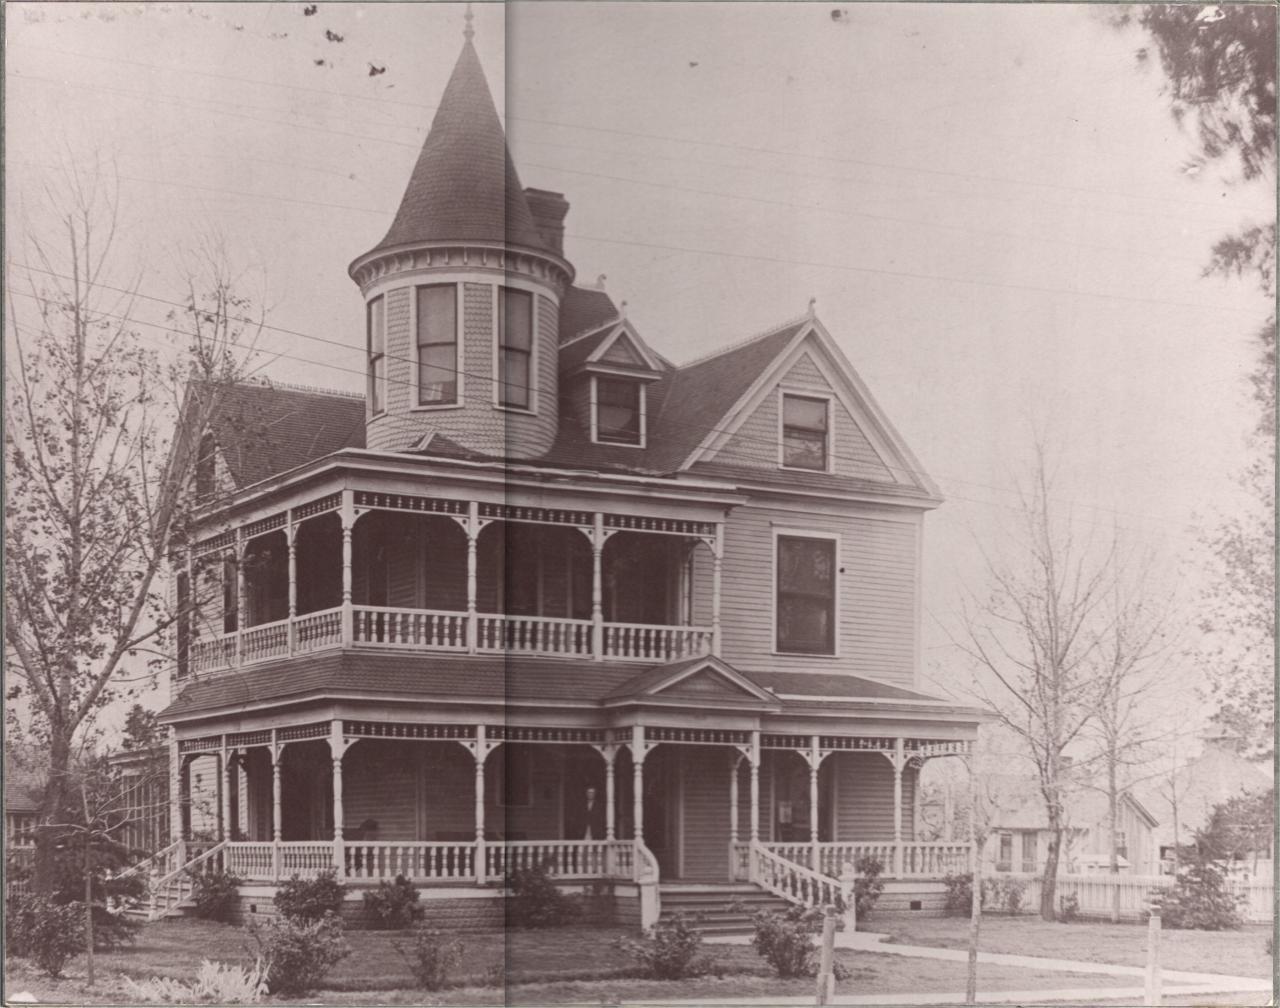 Old Victorian Houses | 1903 Victorian Home | Old Victorian Homes ...